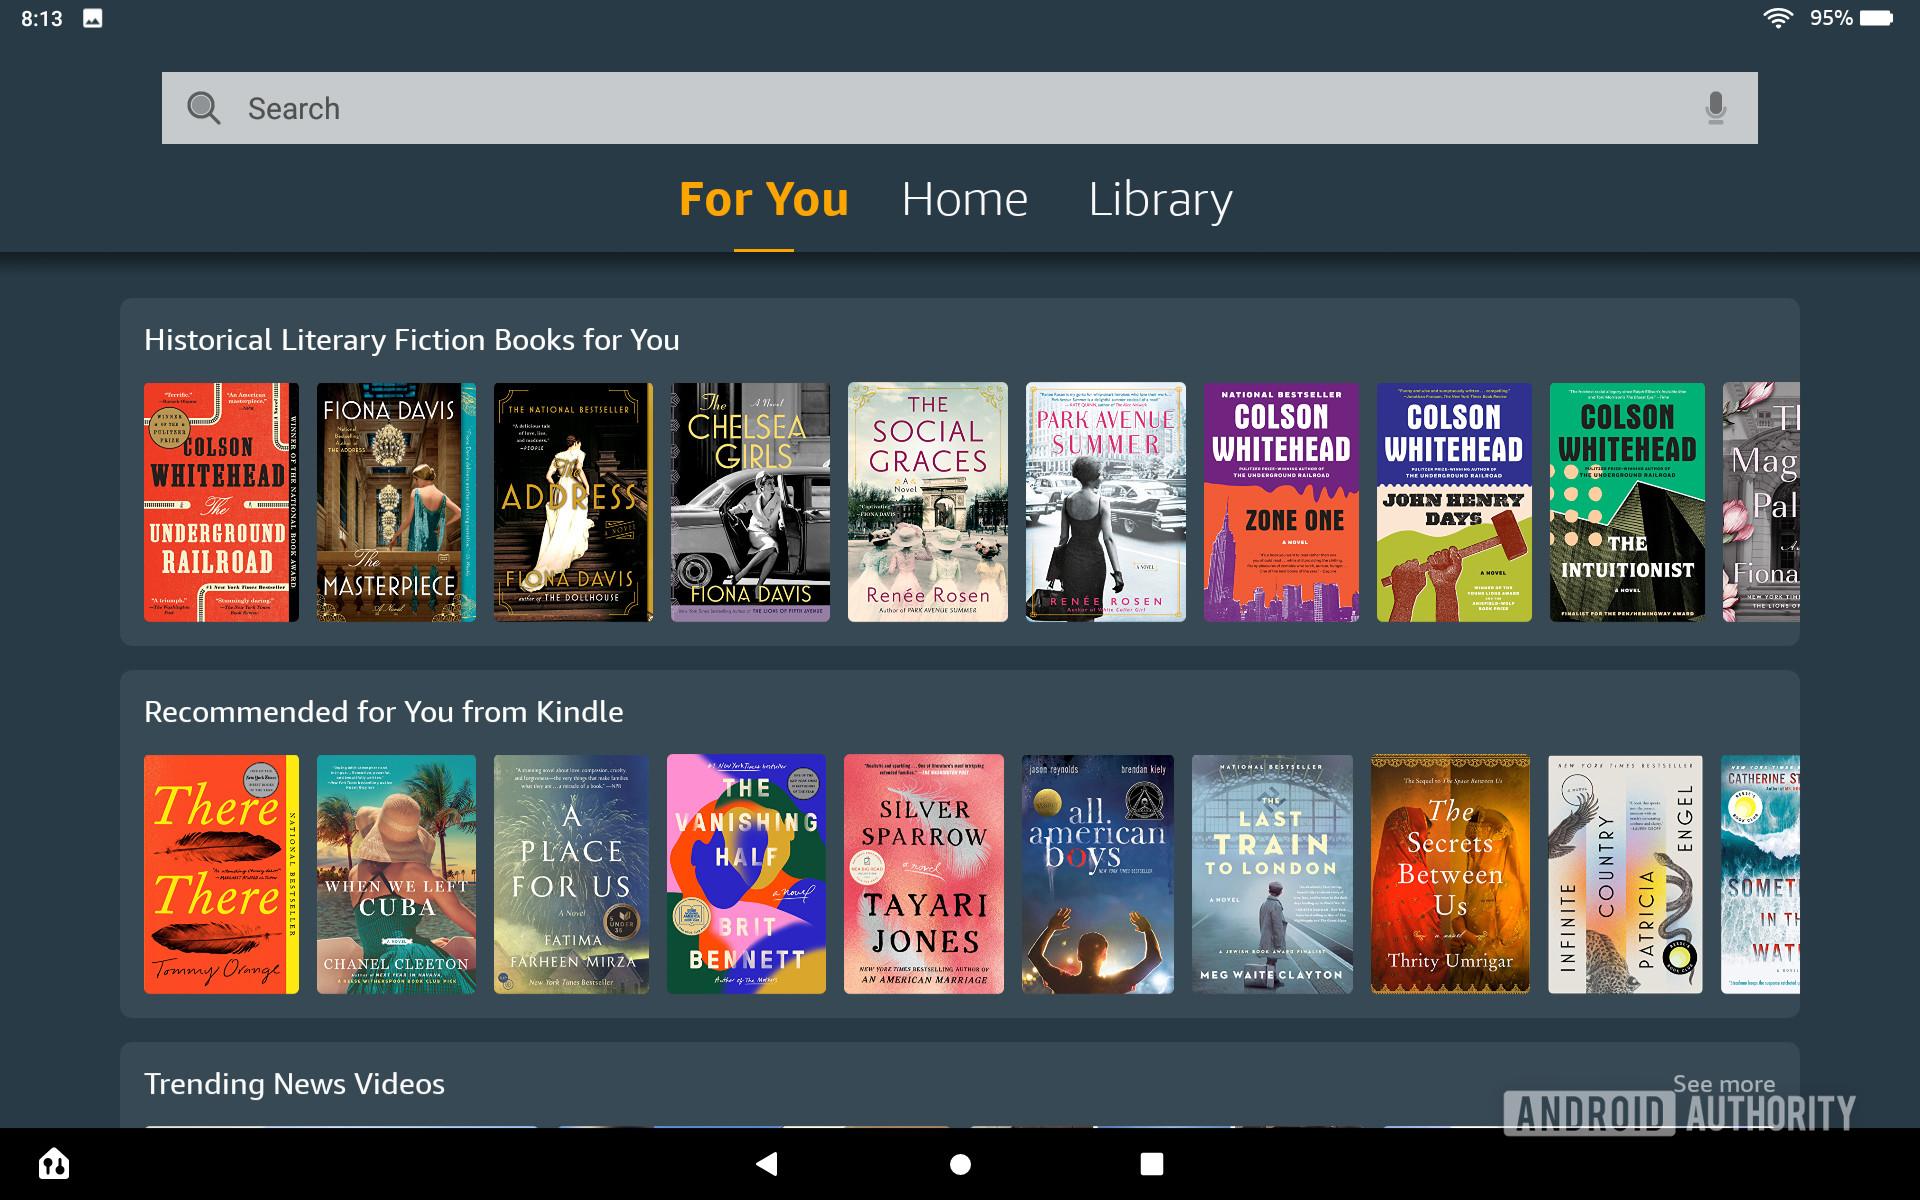 The Amazon Fire HD 10 Plus For You Menu.